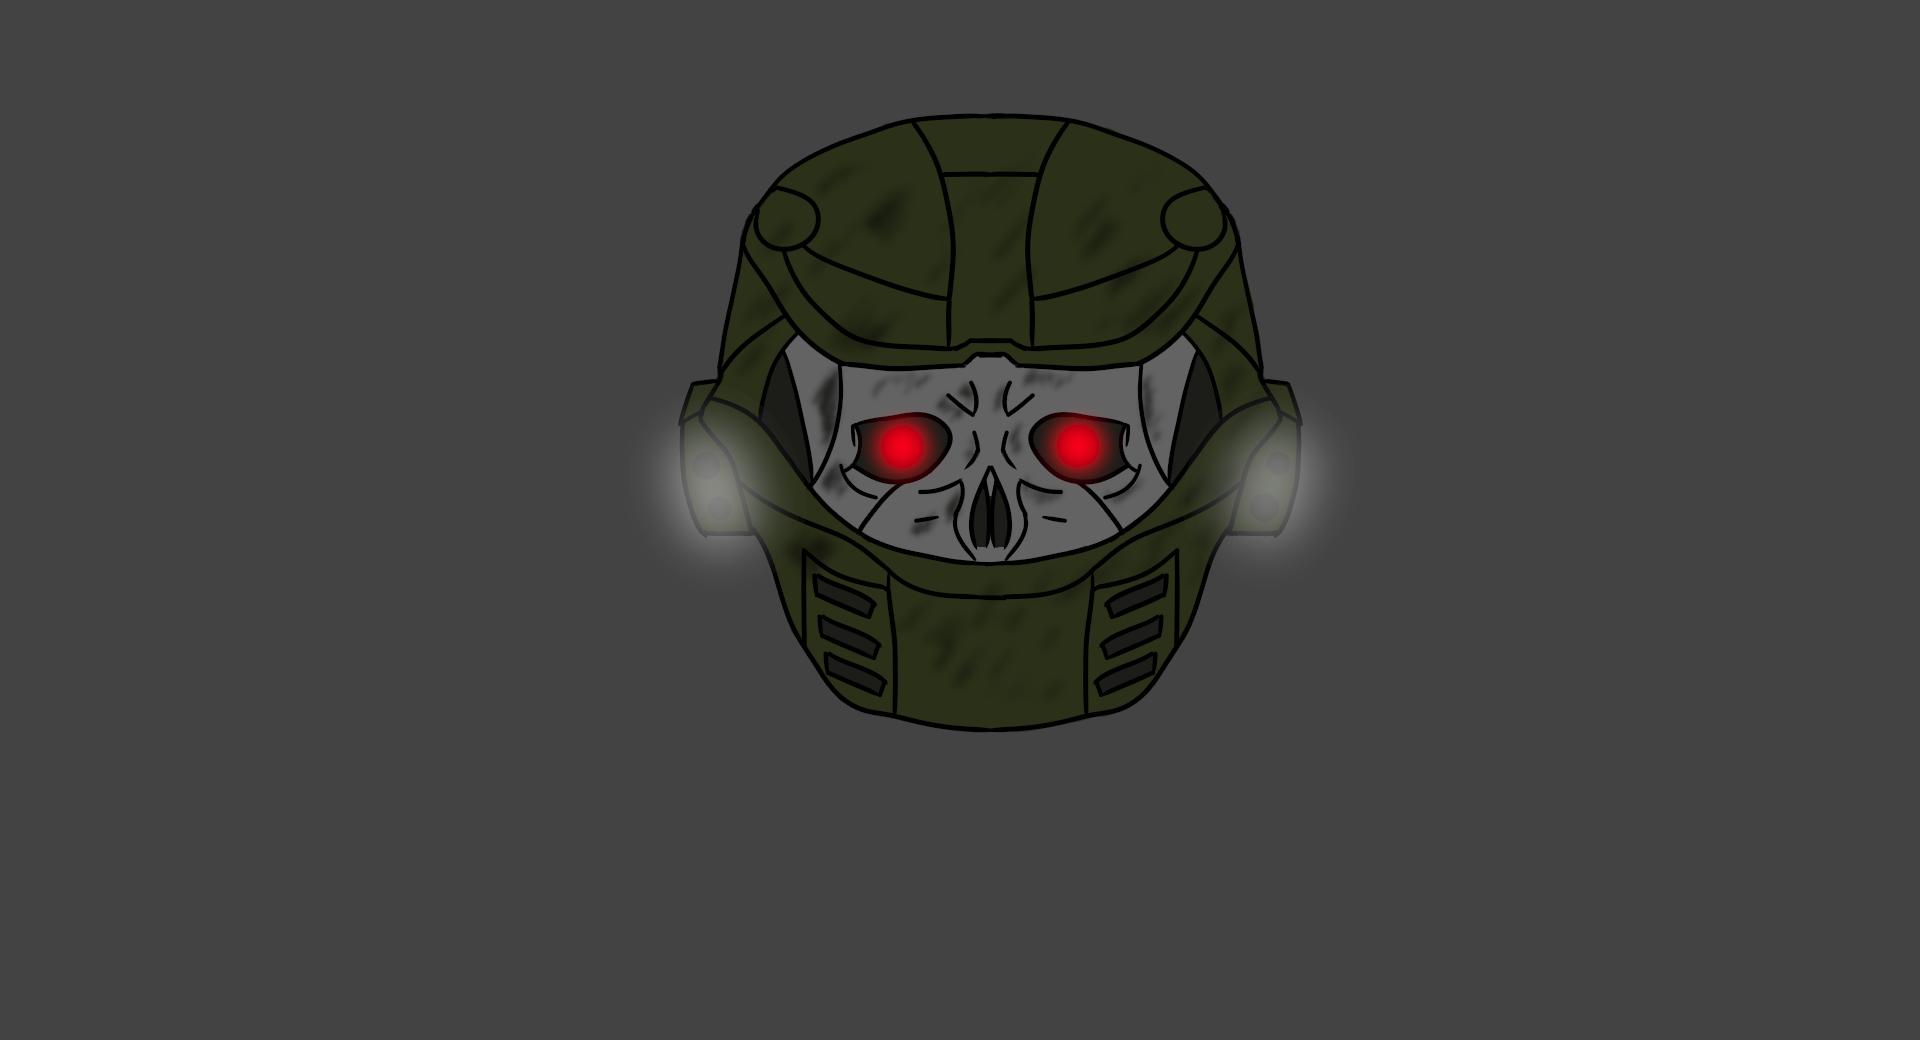 Halo Master Chief Helmet